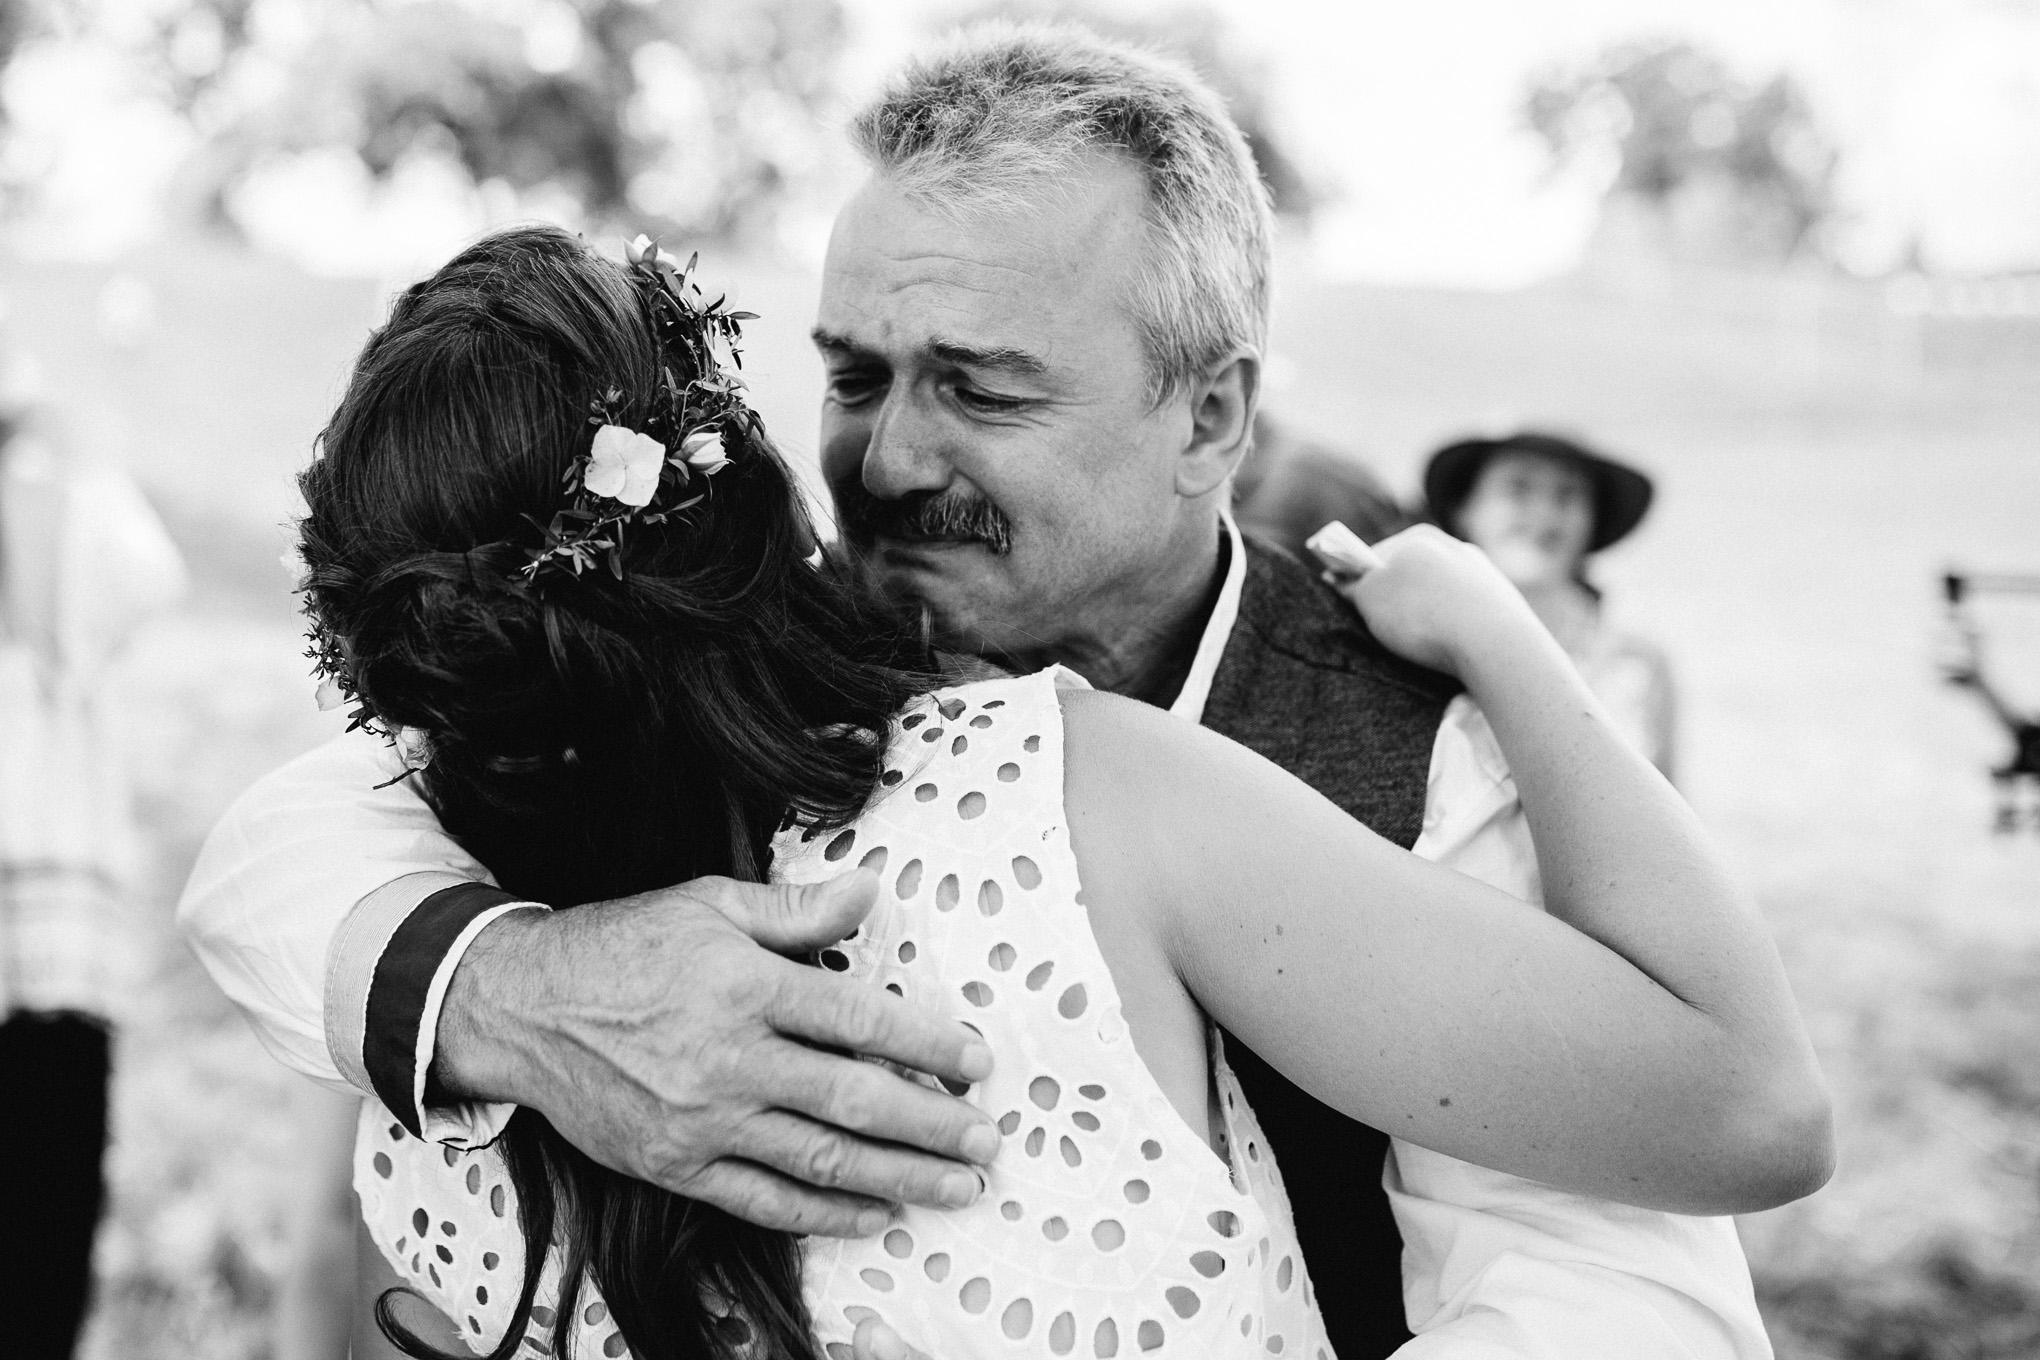 Boho-Scheune-Bauern-Hochzeit-Lörrach-Rheinfelden-Pia-Anna-Christian-Photography-NC-41.jpg